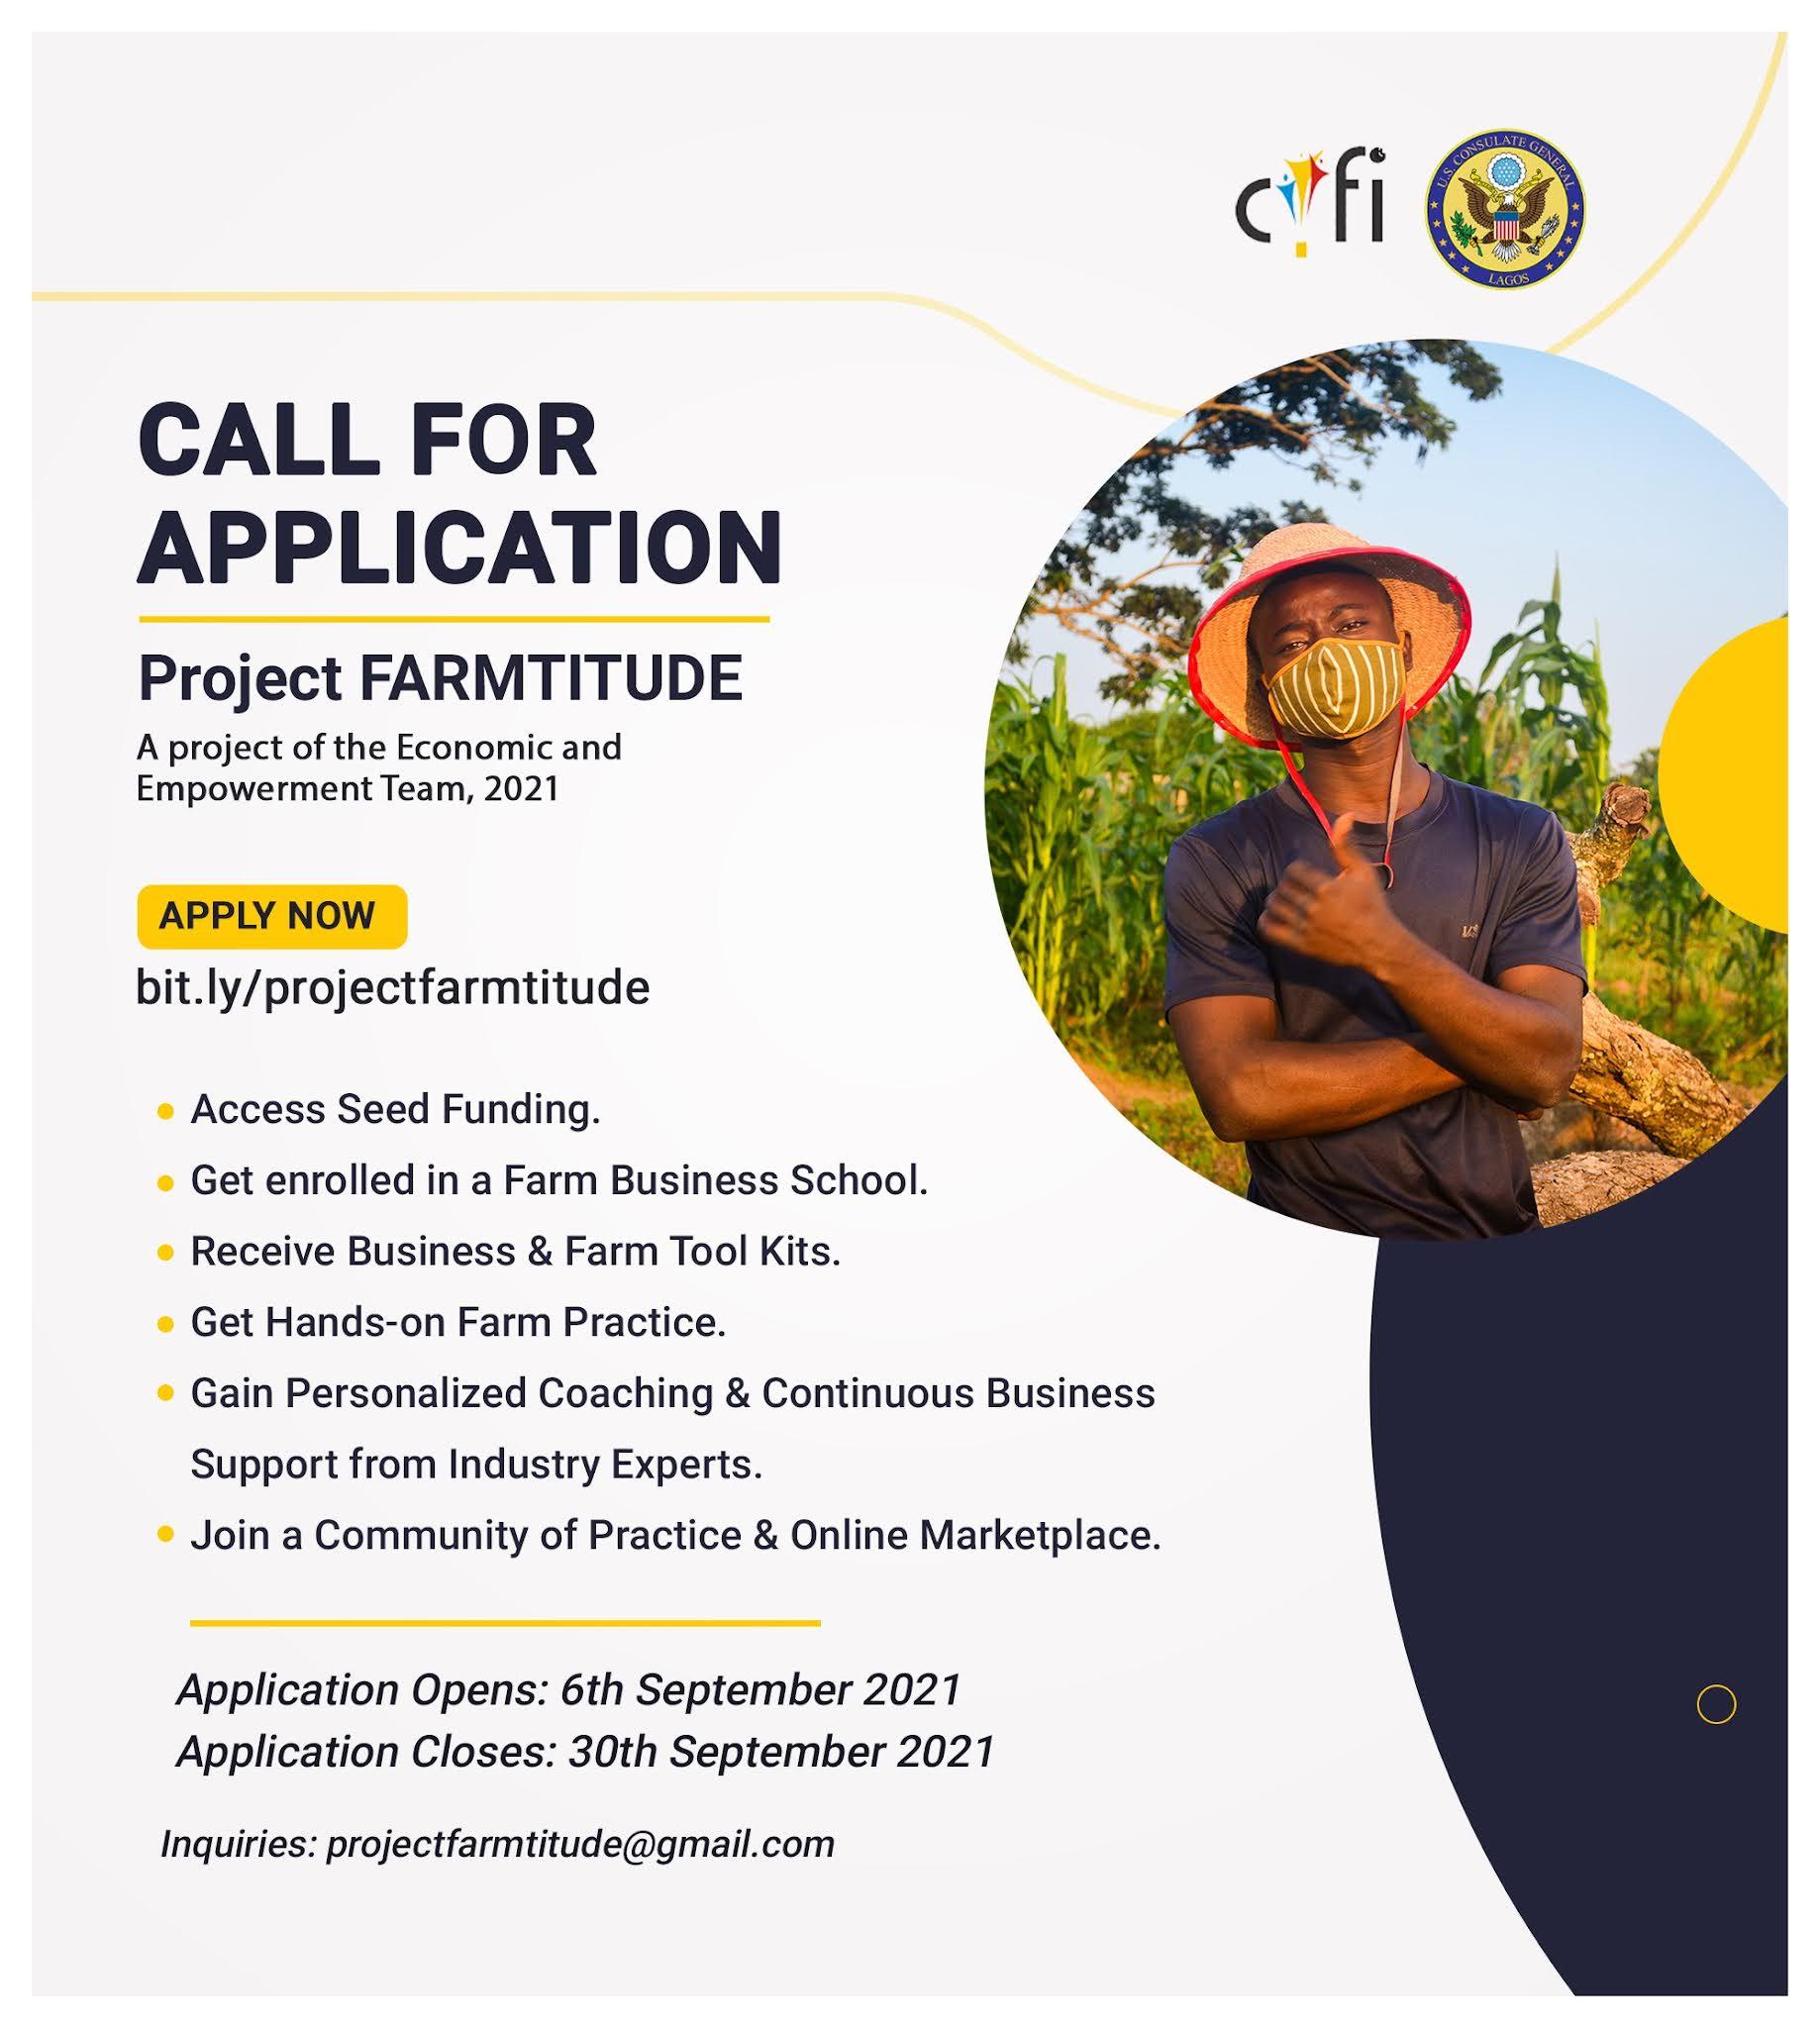 Project FARMTITUDE: Carrington Youth Fellowship Initiative (CYFI) Project Farmtitude 2021 for Agripreneurs